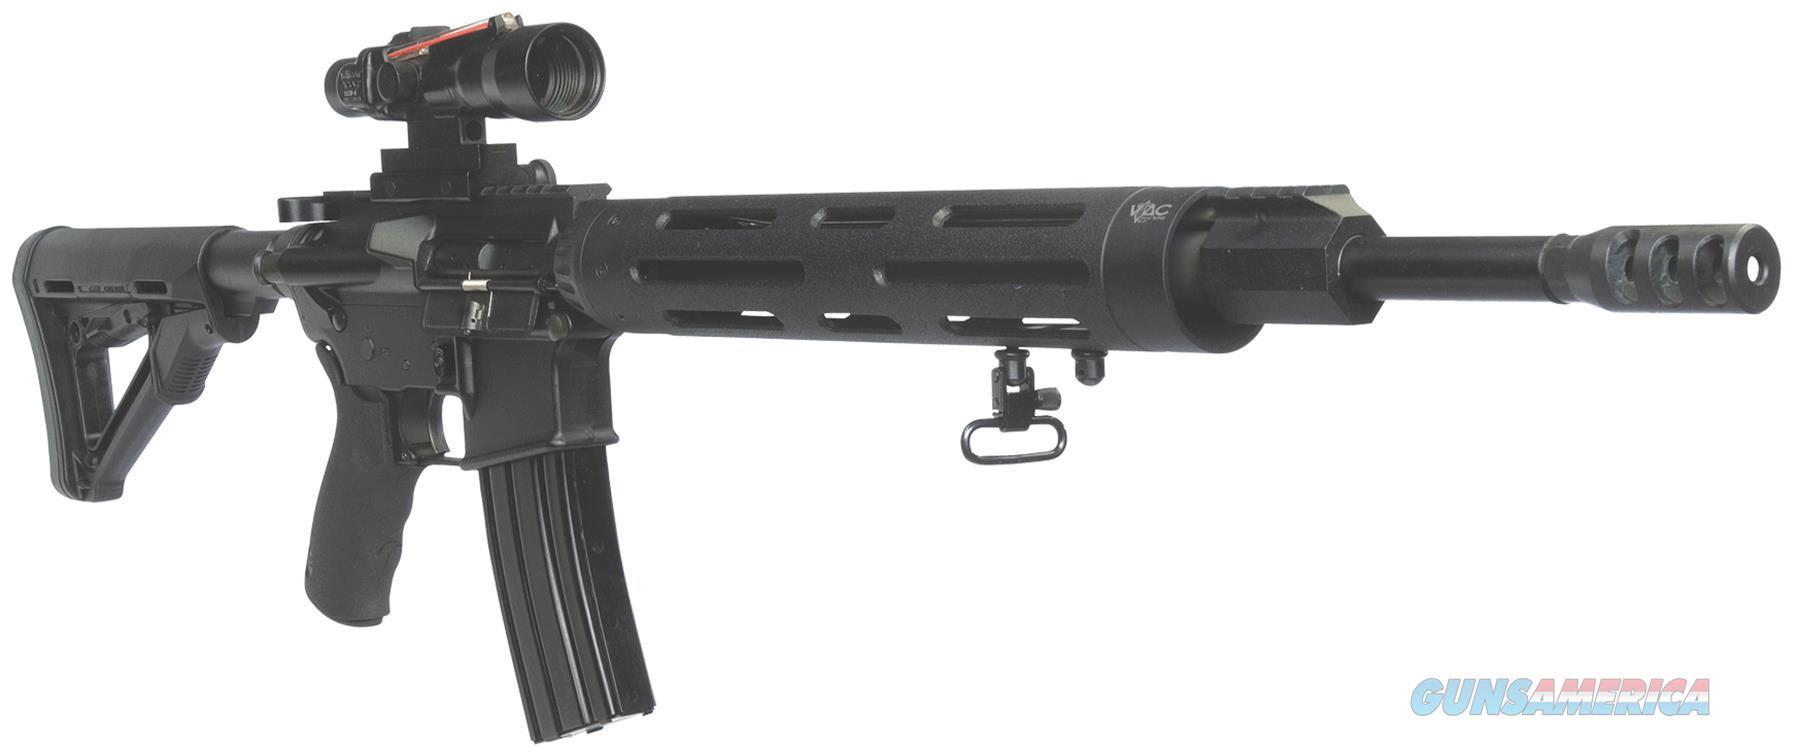 "Dpms 60521 3G1 Competition Rifle Semi-Automatic 223 Remington/5.56 Nato 18"" 30+1 Magpul Ctr Black Stock Black 60521  Guns > Rifles > D Misc Rifles"